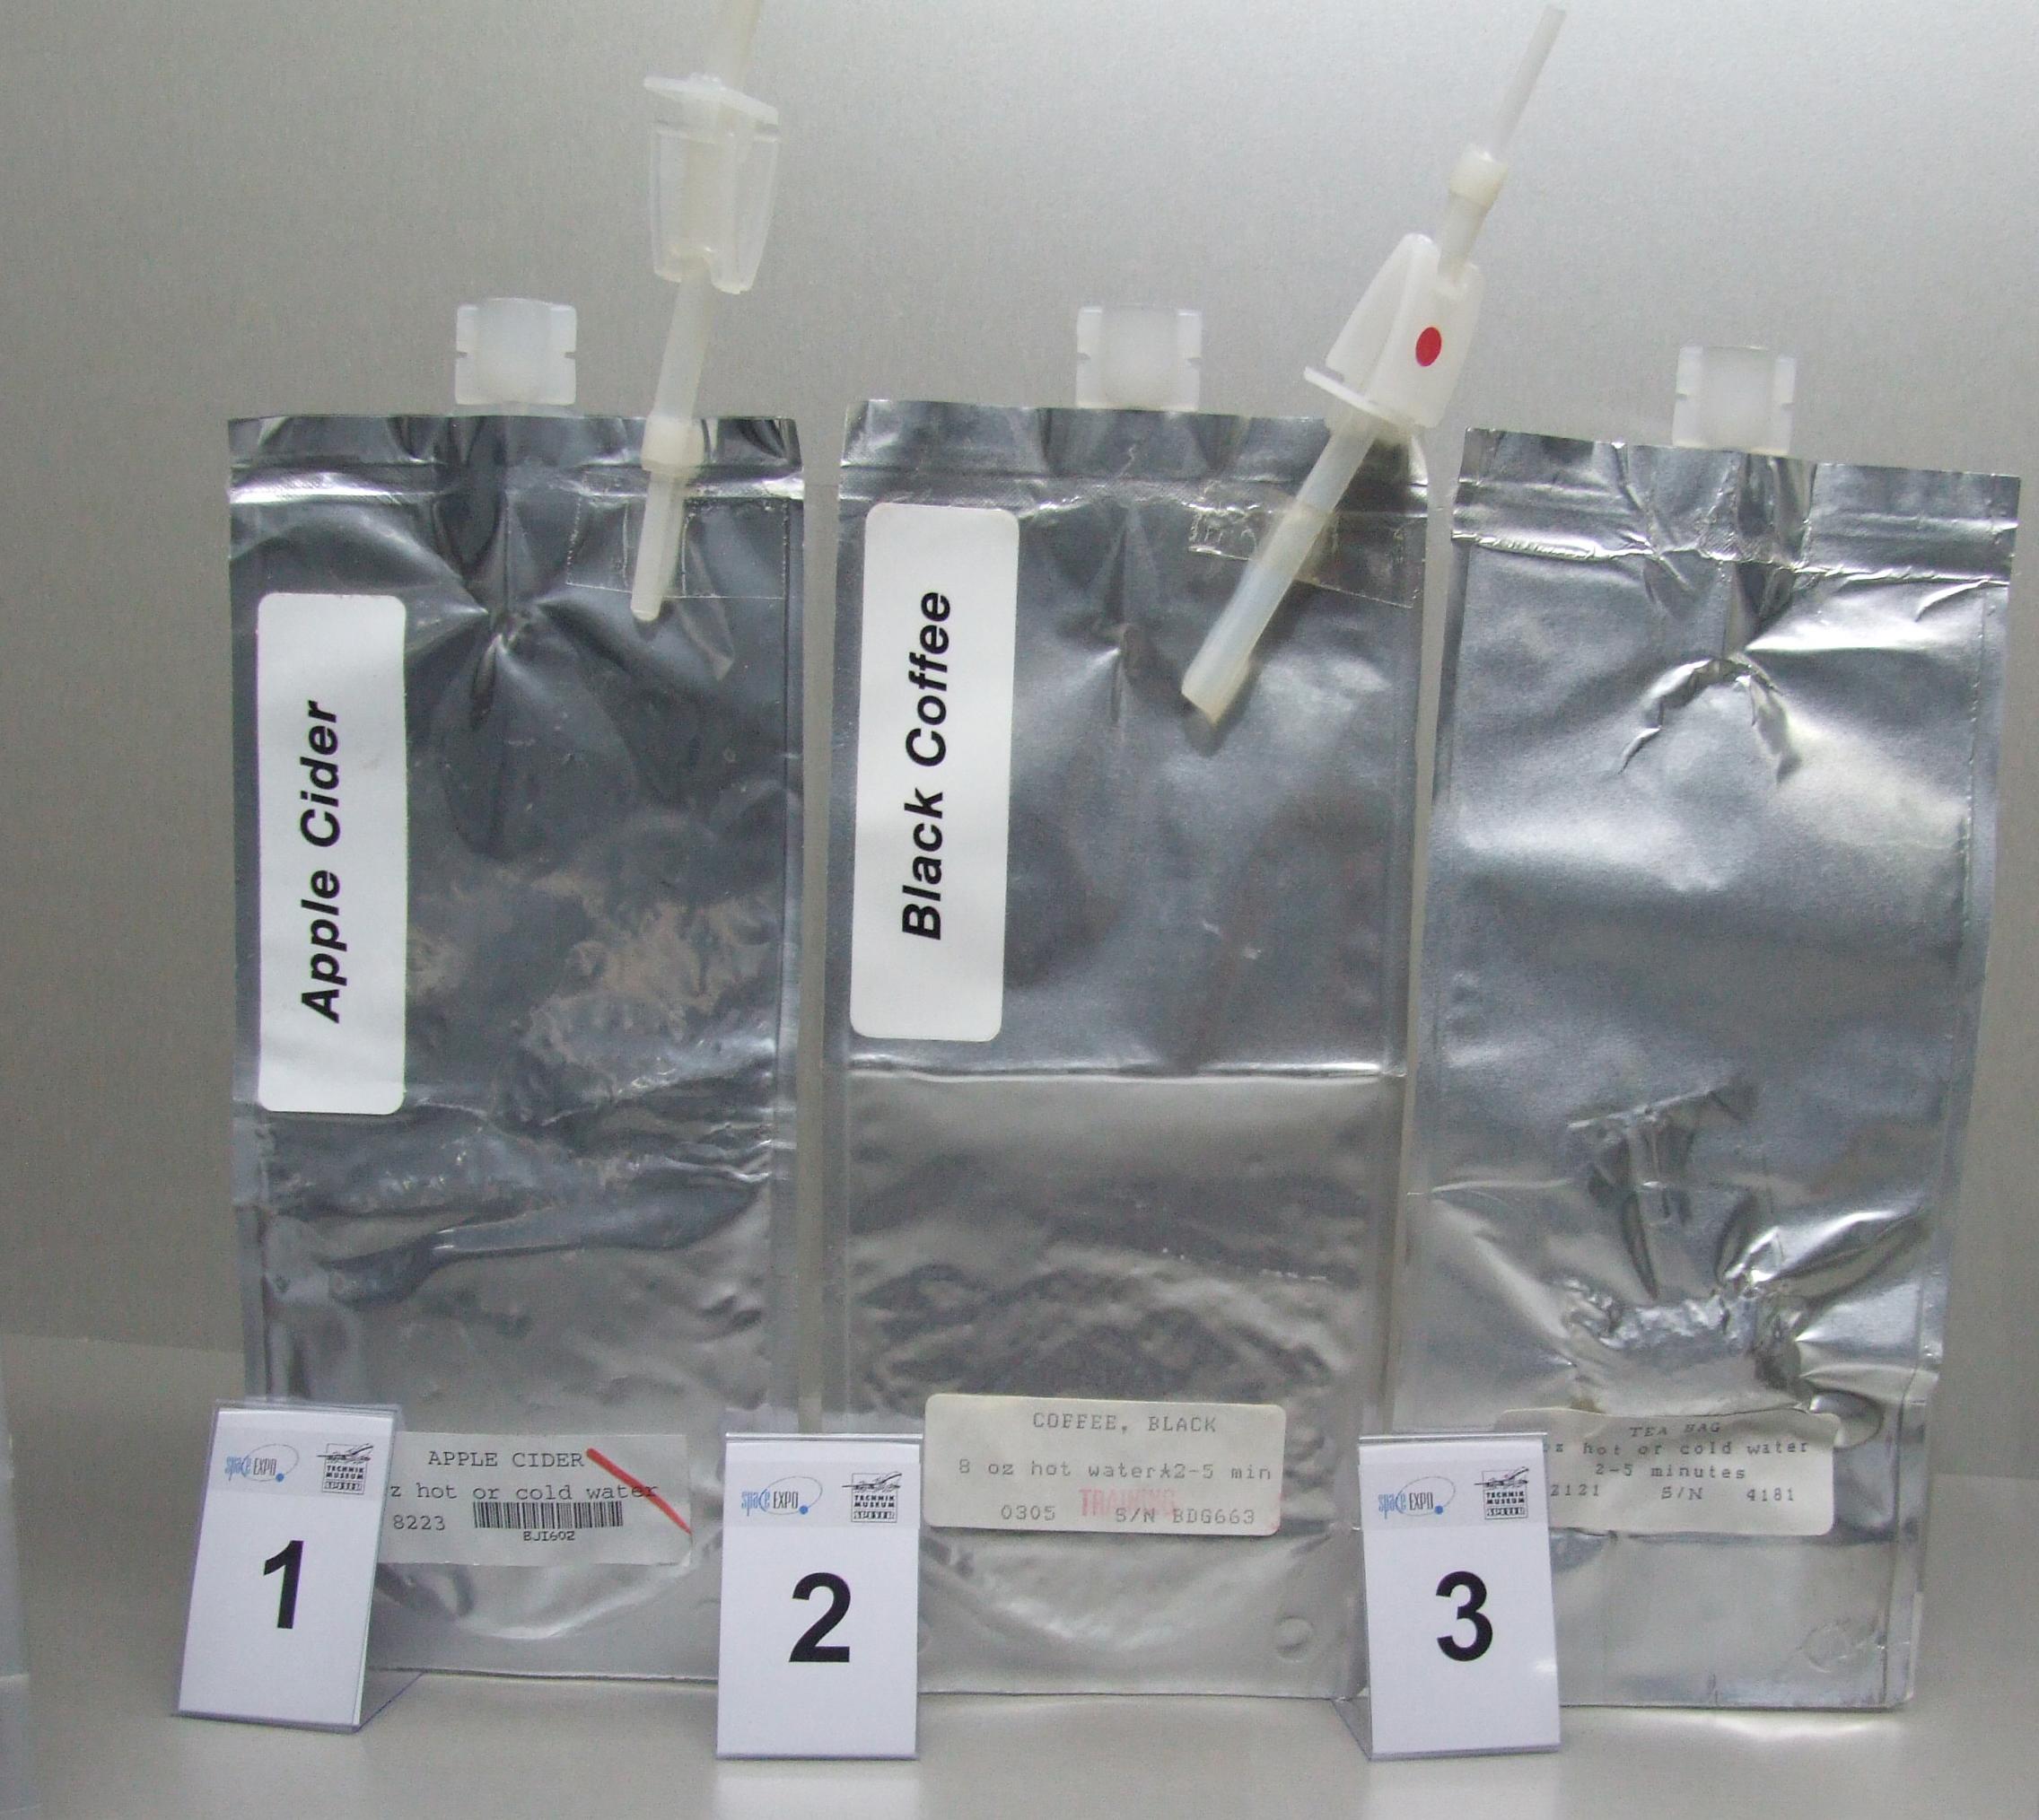 Bolsas de agua - 1 part 6